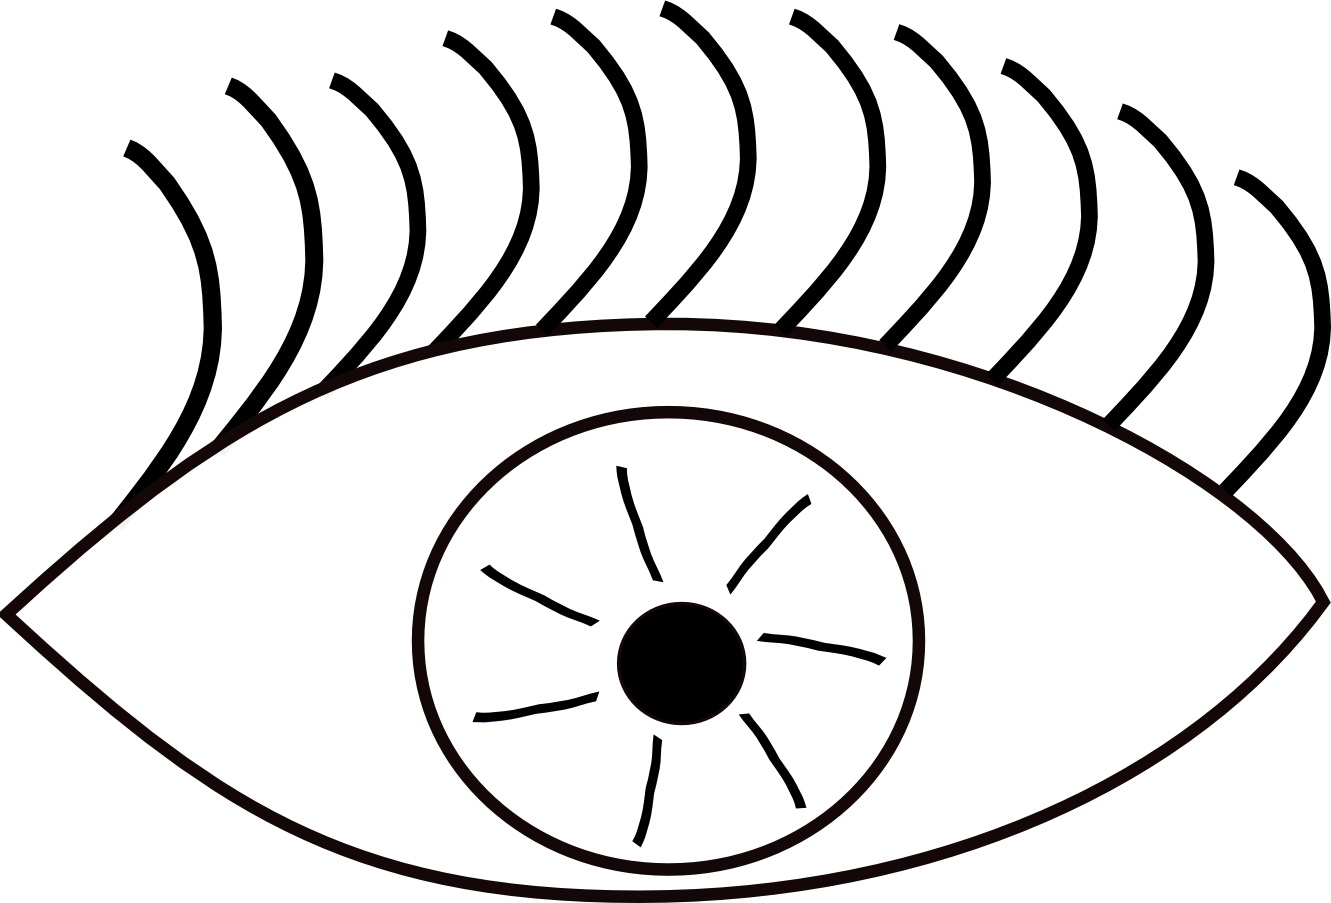 Eyeball eyes cartoon eye clip art free vector in open office.